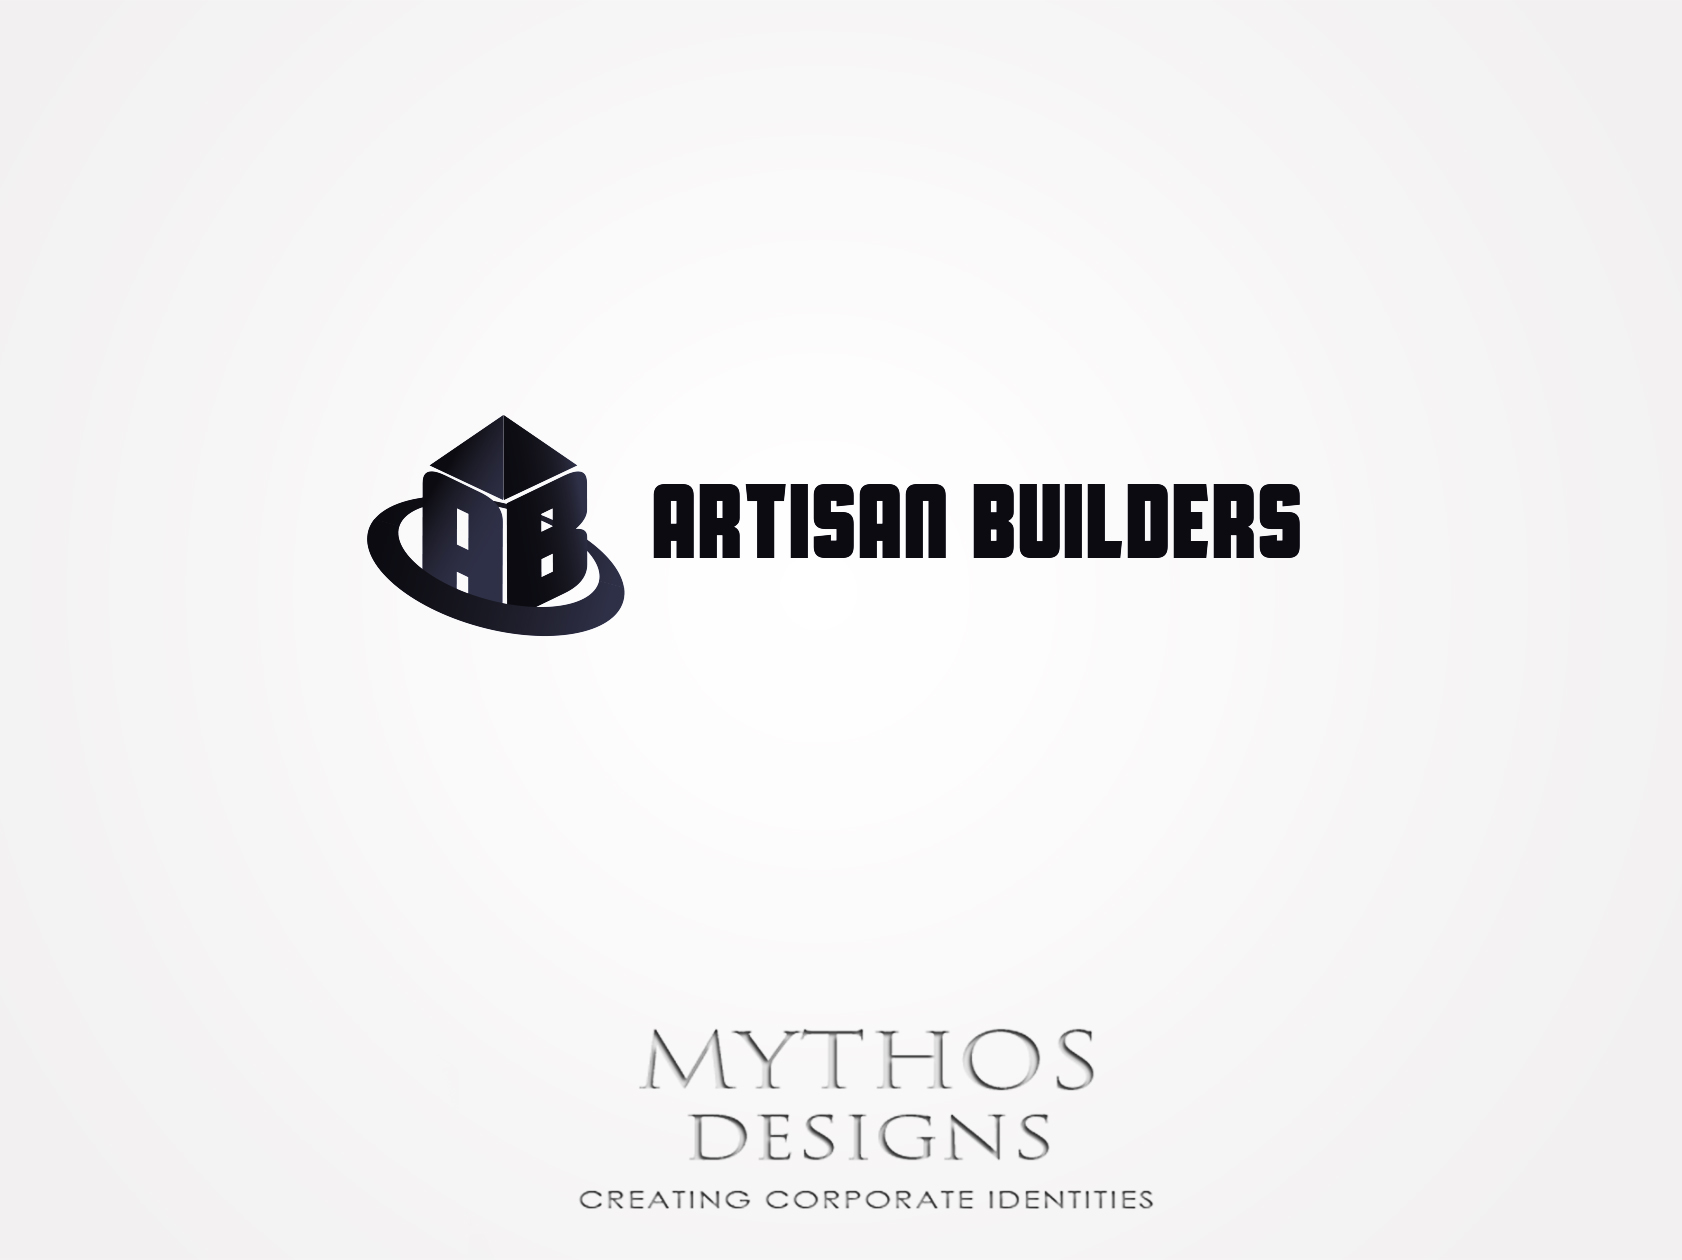 Logo Design by Mythos Designs - Entry No. 46 in the Logo Design Contest Captivating Logo Design for Artisan Builders.